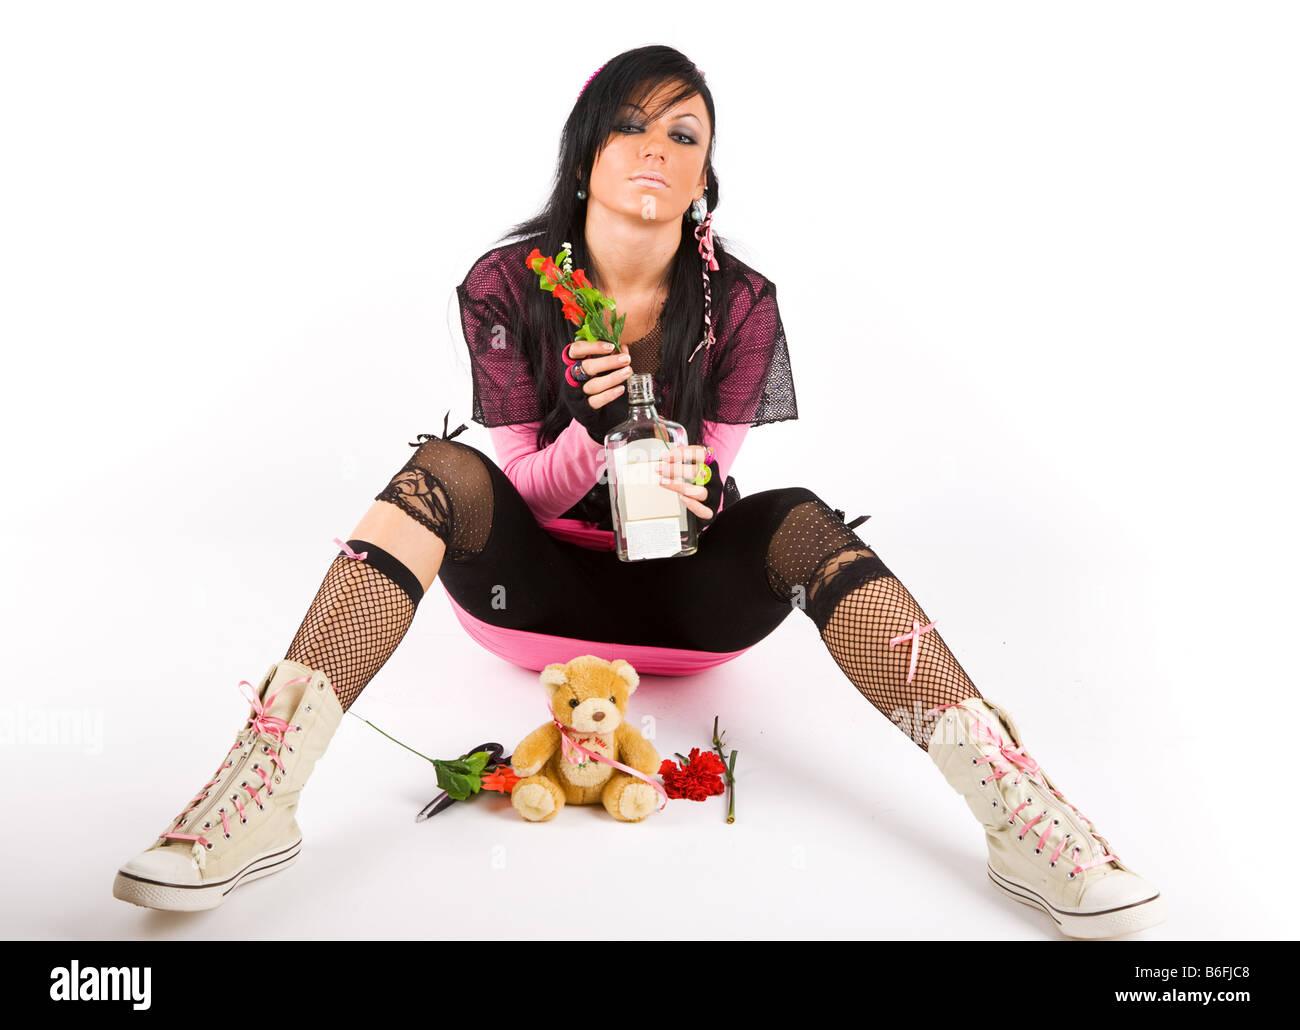 EMO girl with bottle - Stock Image